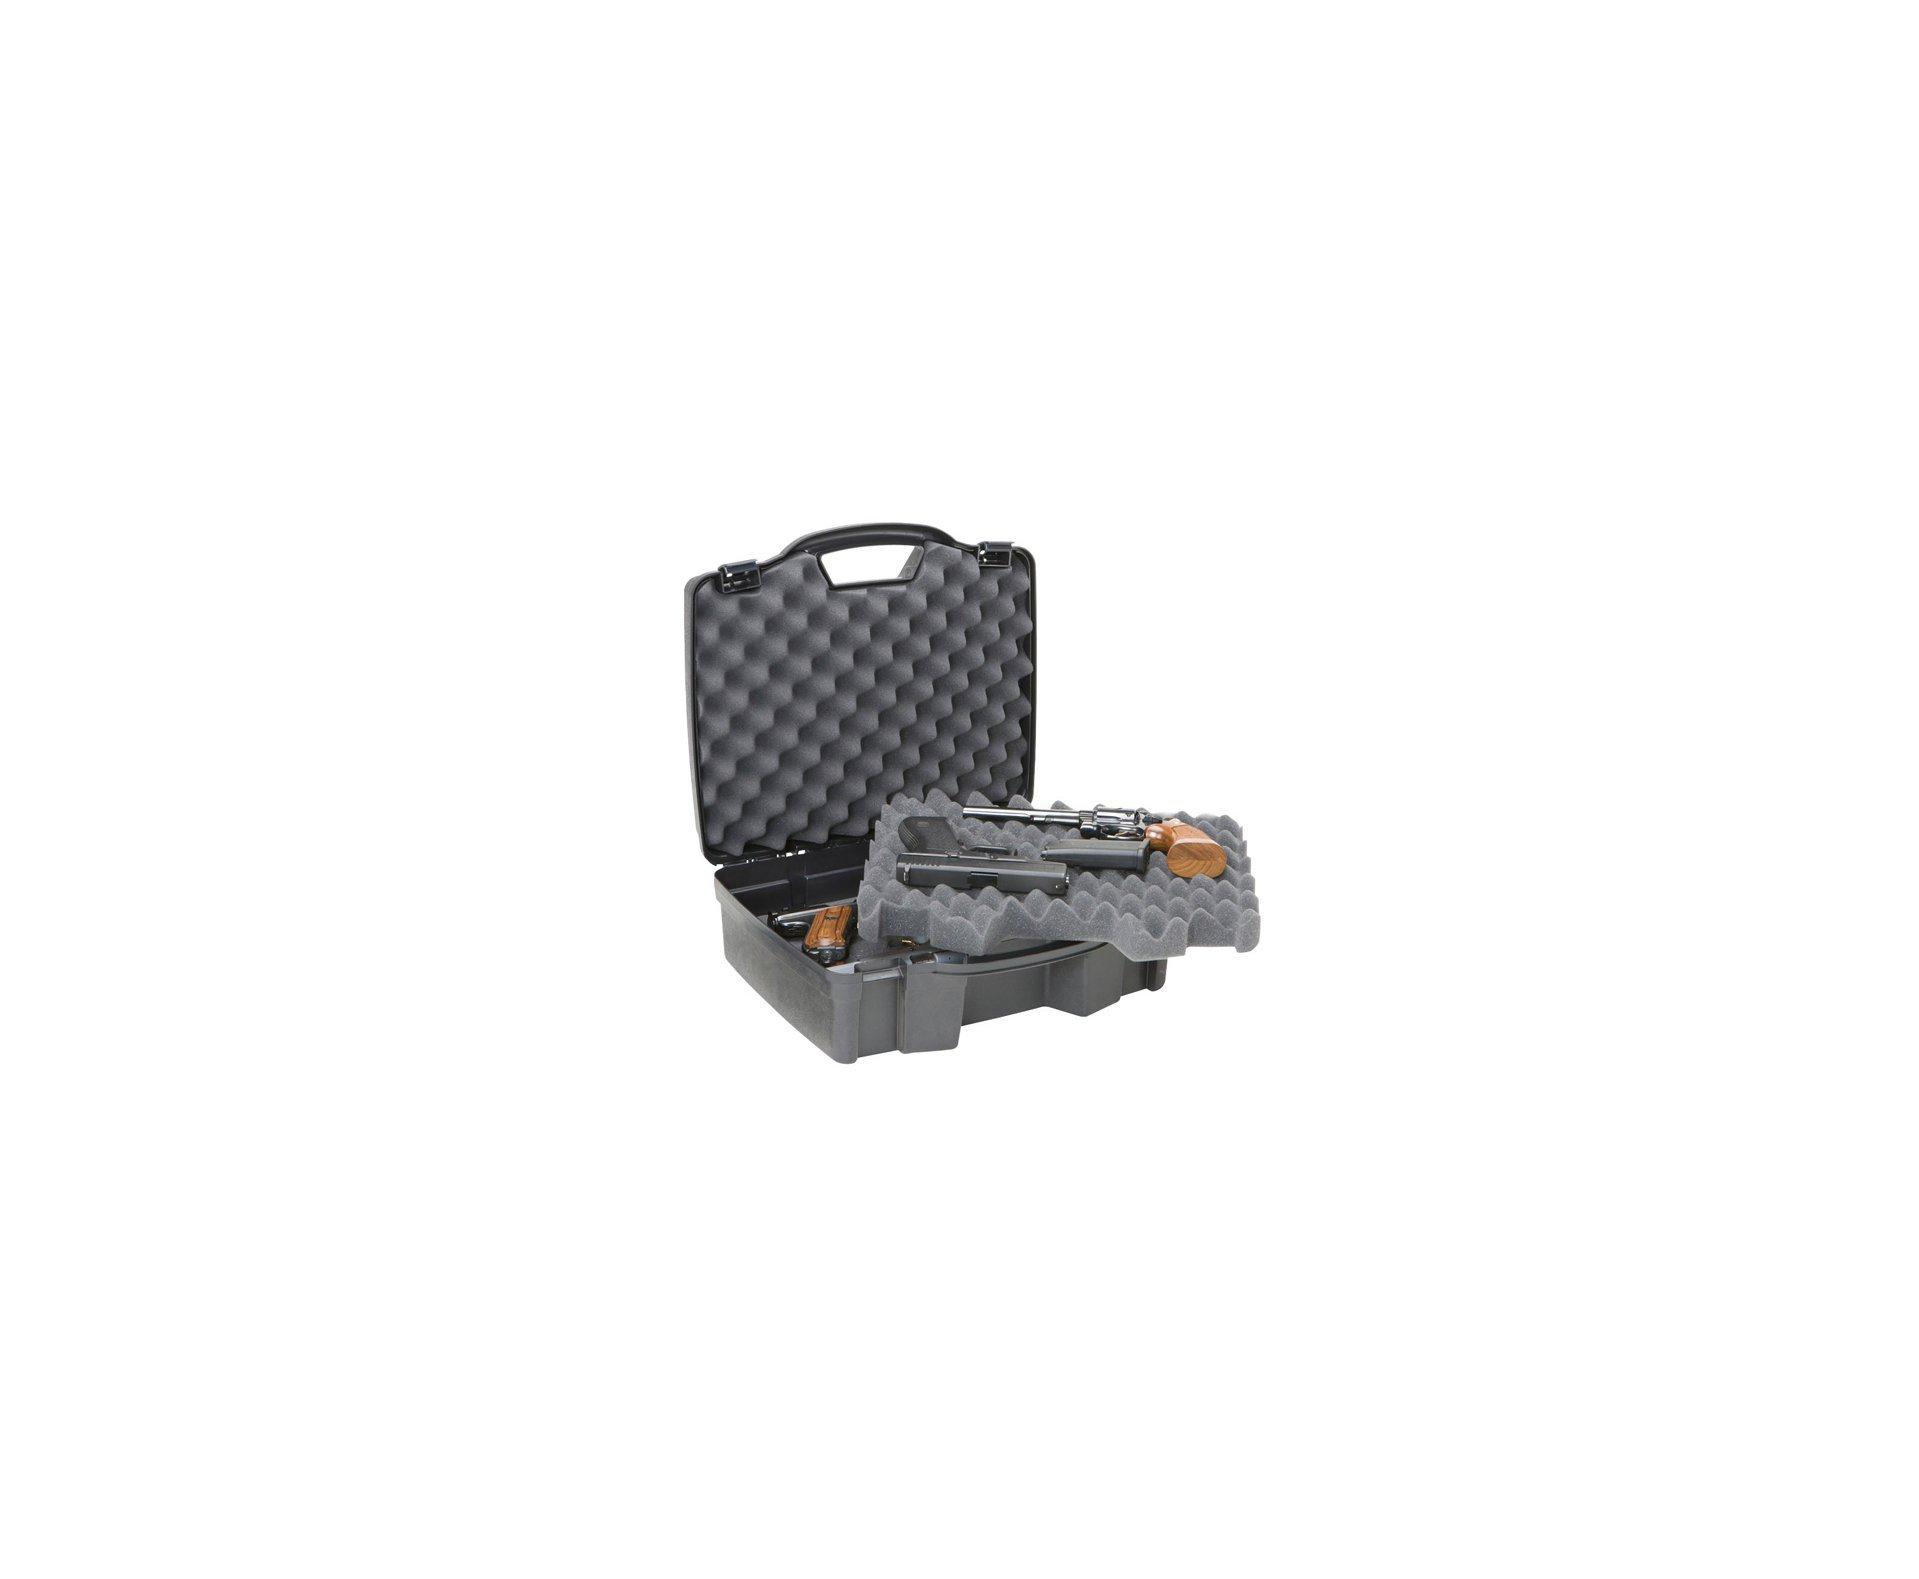 Caixa (case) Para Armas Curtas - 1404-02 - Plano